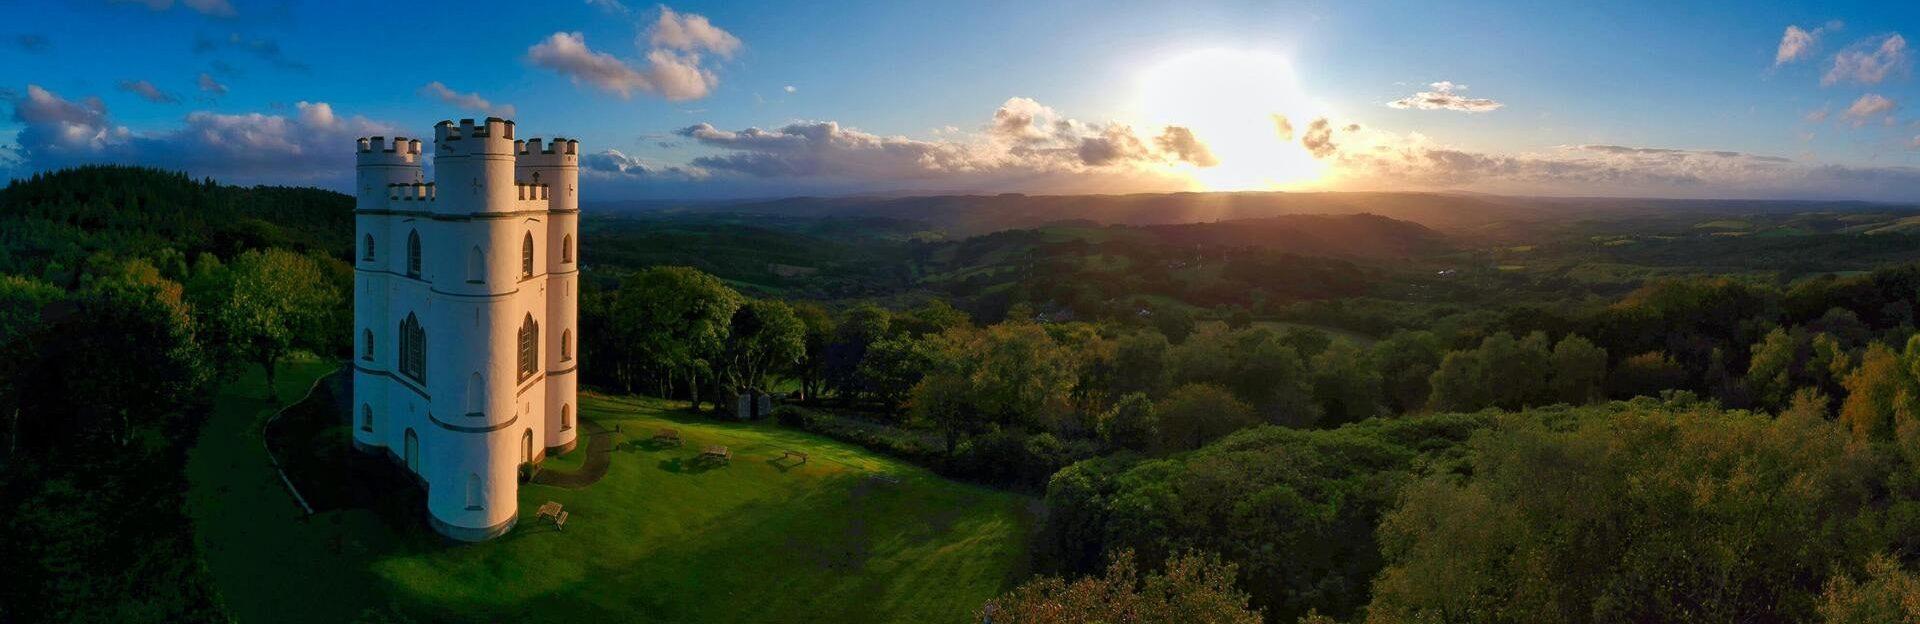 Devons hilltop view